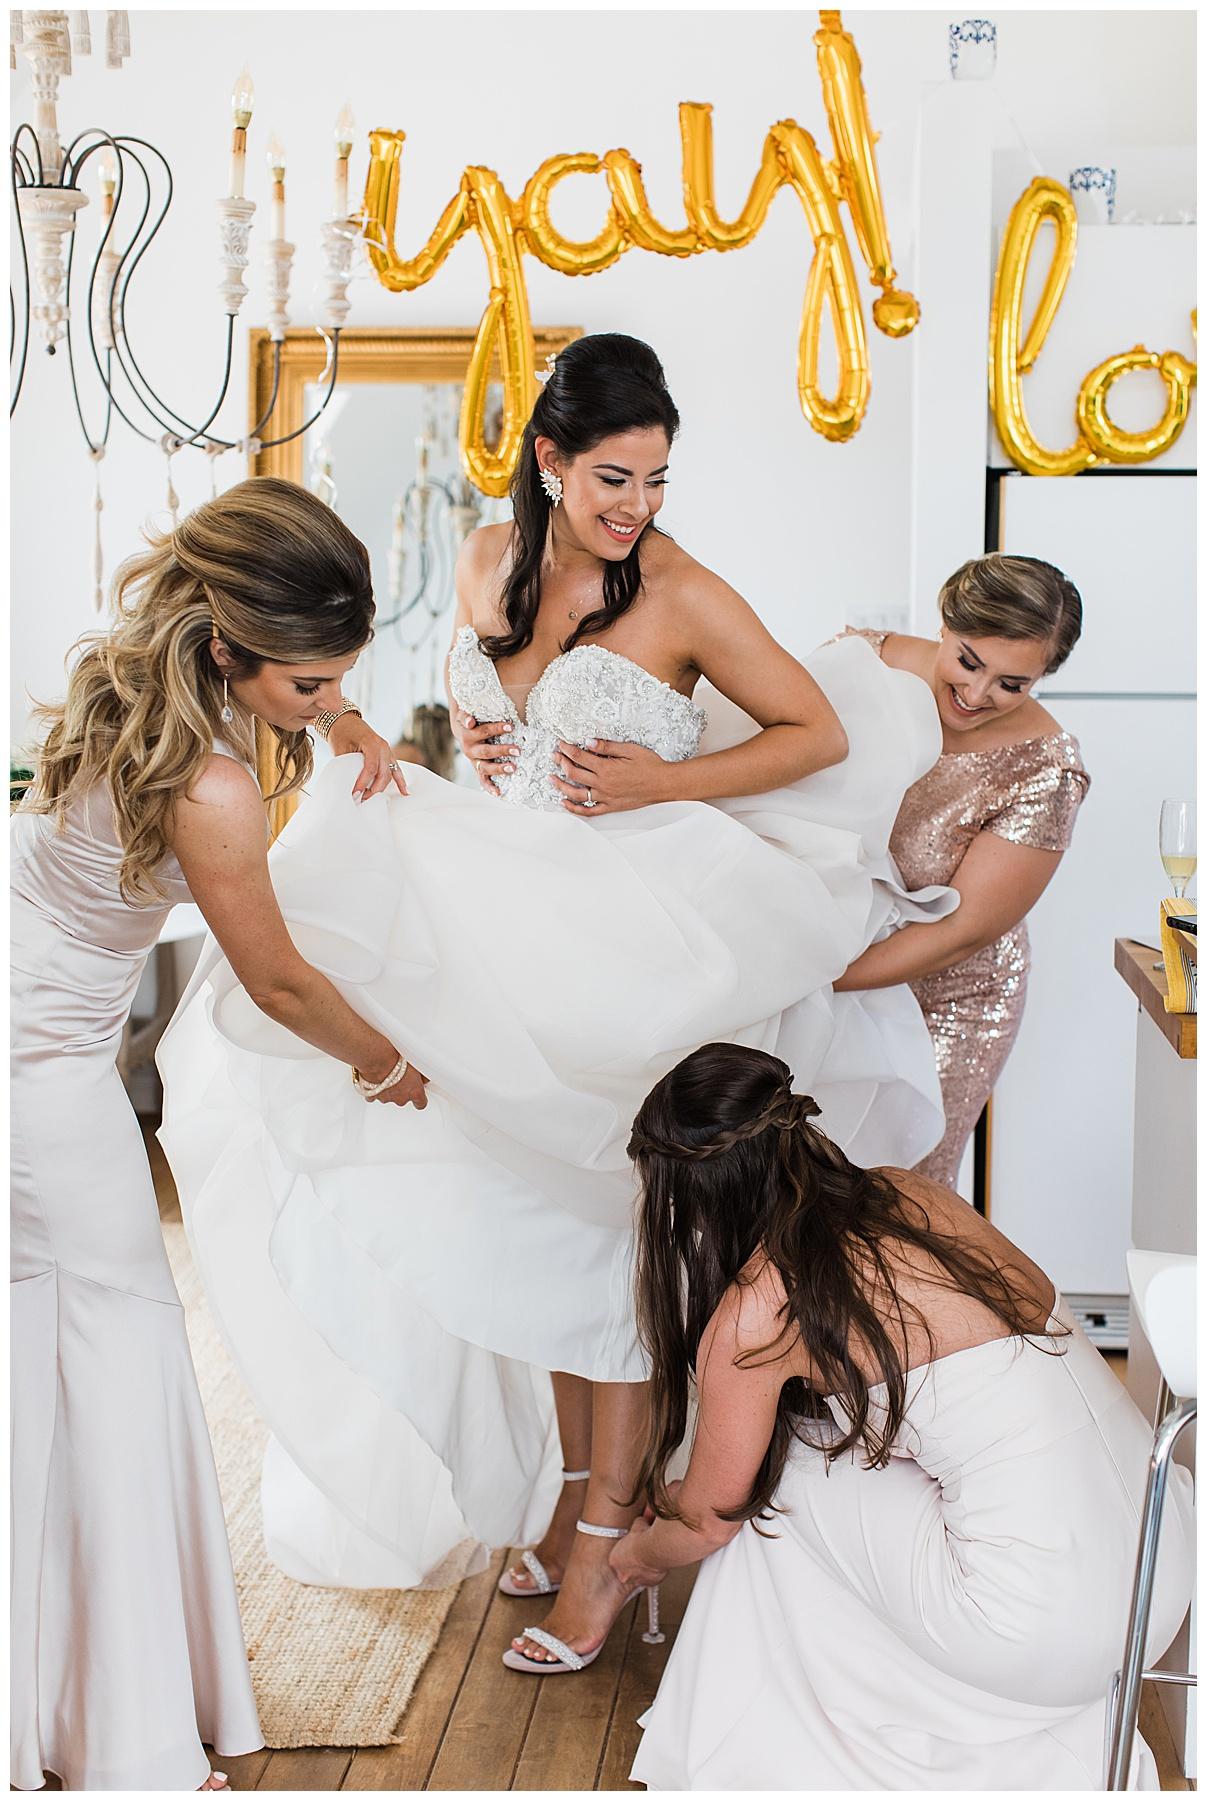 Bridesmaids helping bride put shoes on| Belcroft Estate Wedding| Toronto wedding photographer| Ontario wedding photographer| 3photography